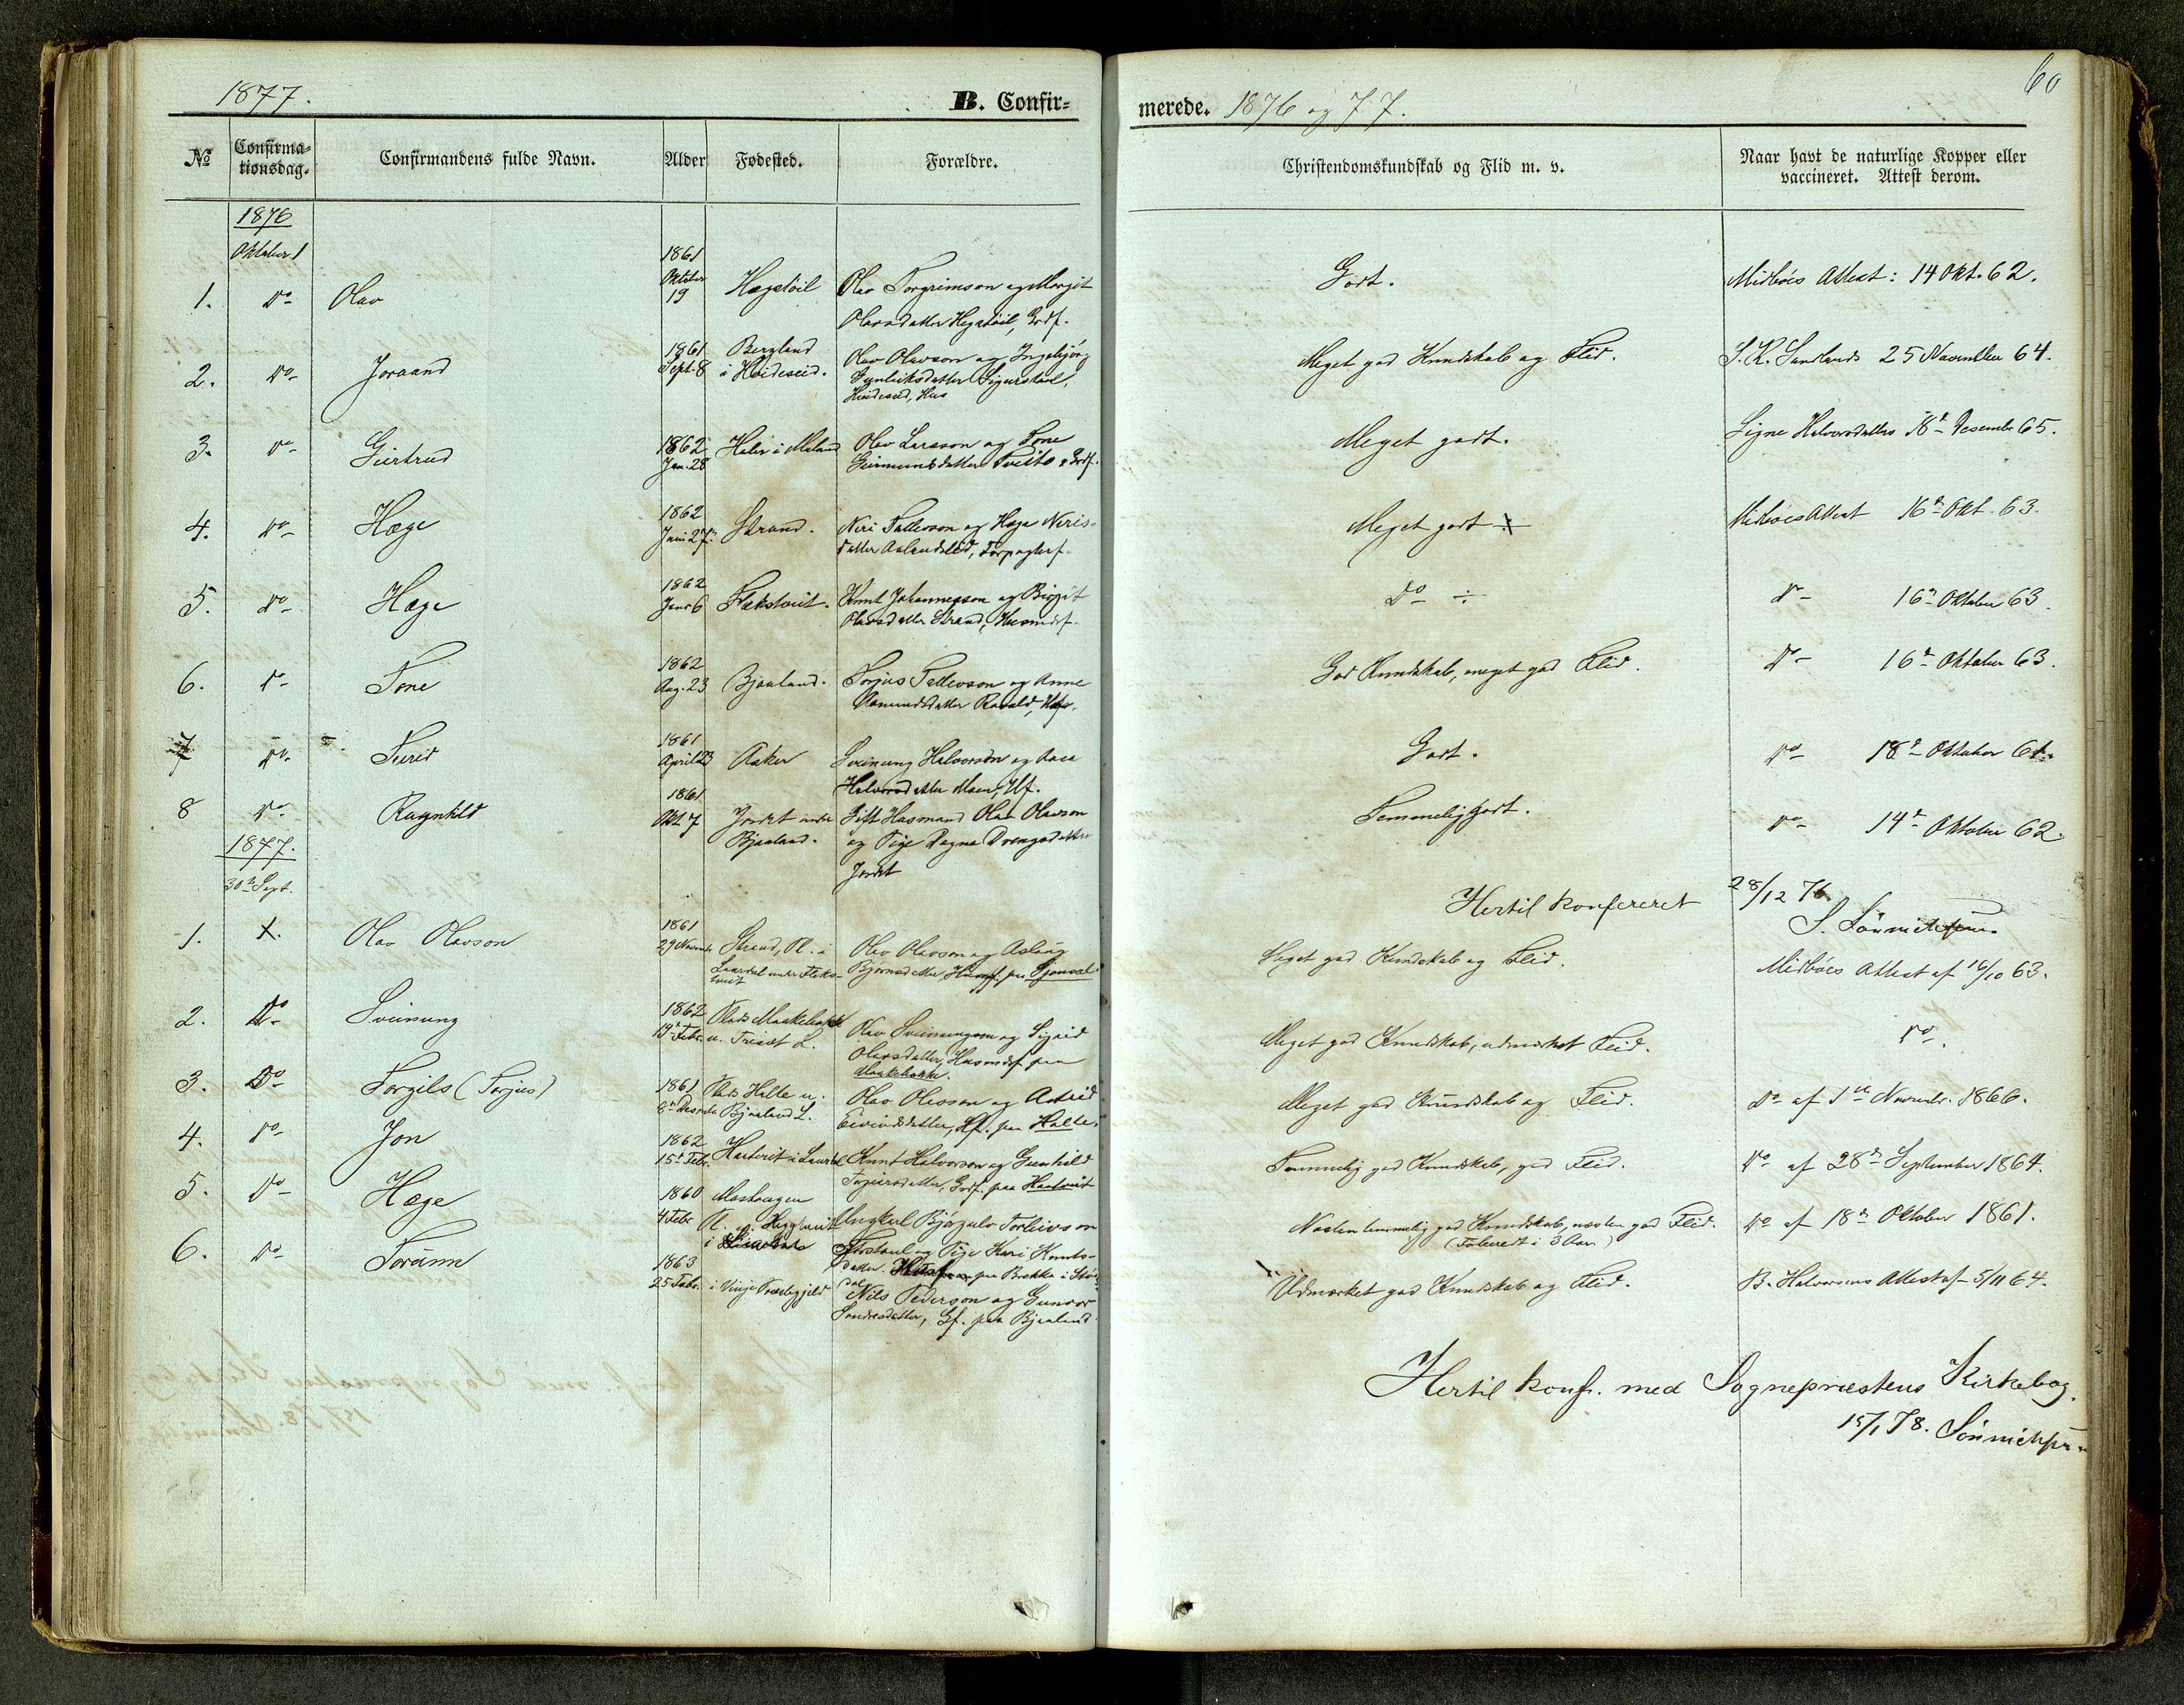 SAKO, Lårdal kirkebøker, G/Ga/L0002: Klokkerbok nr. I 2, 1861-1890, s. 60